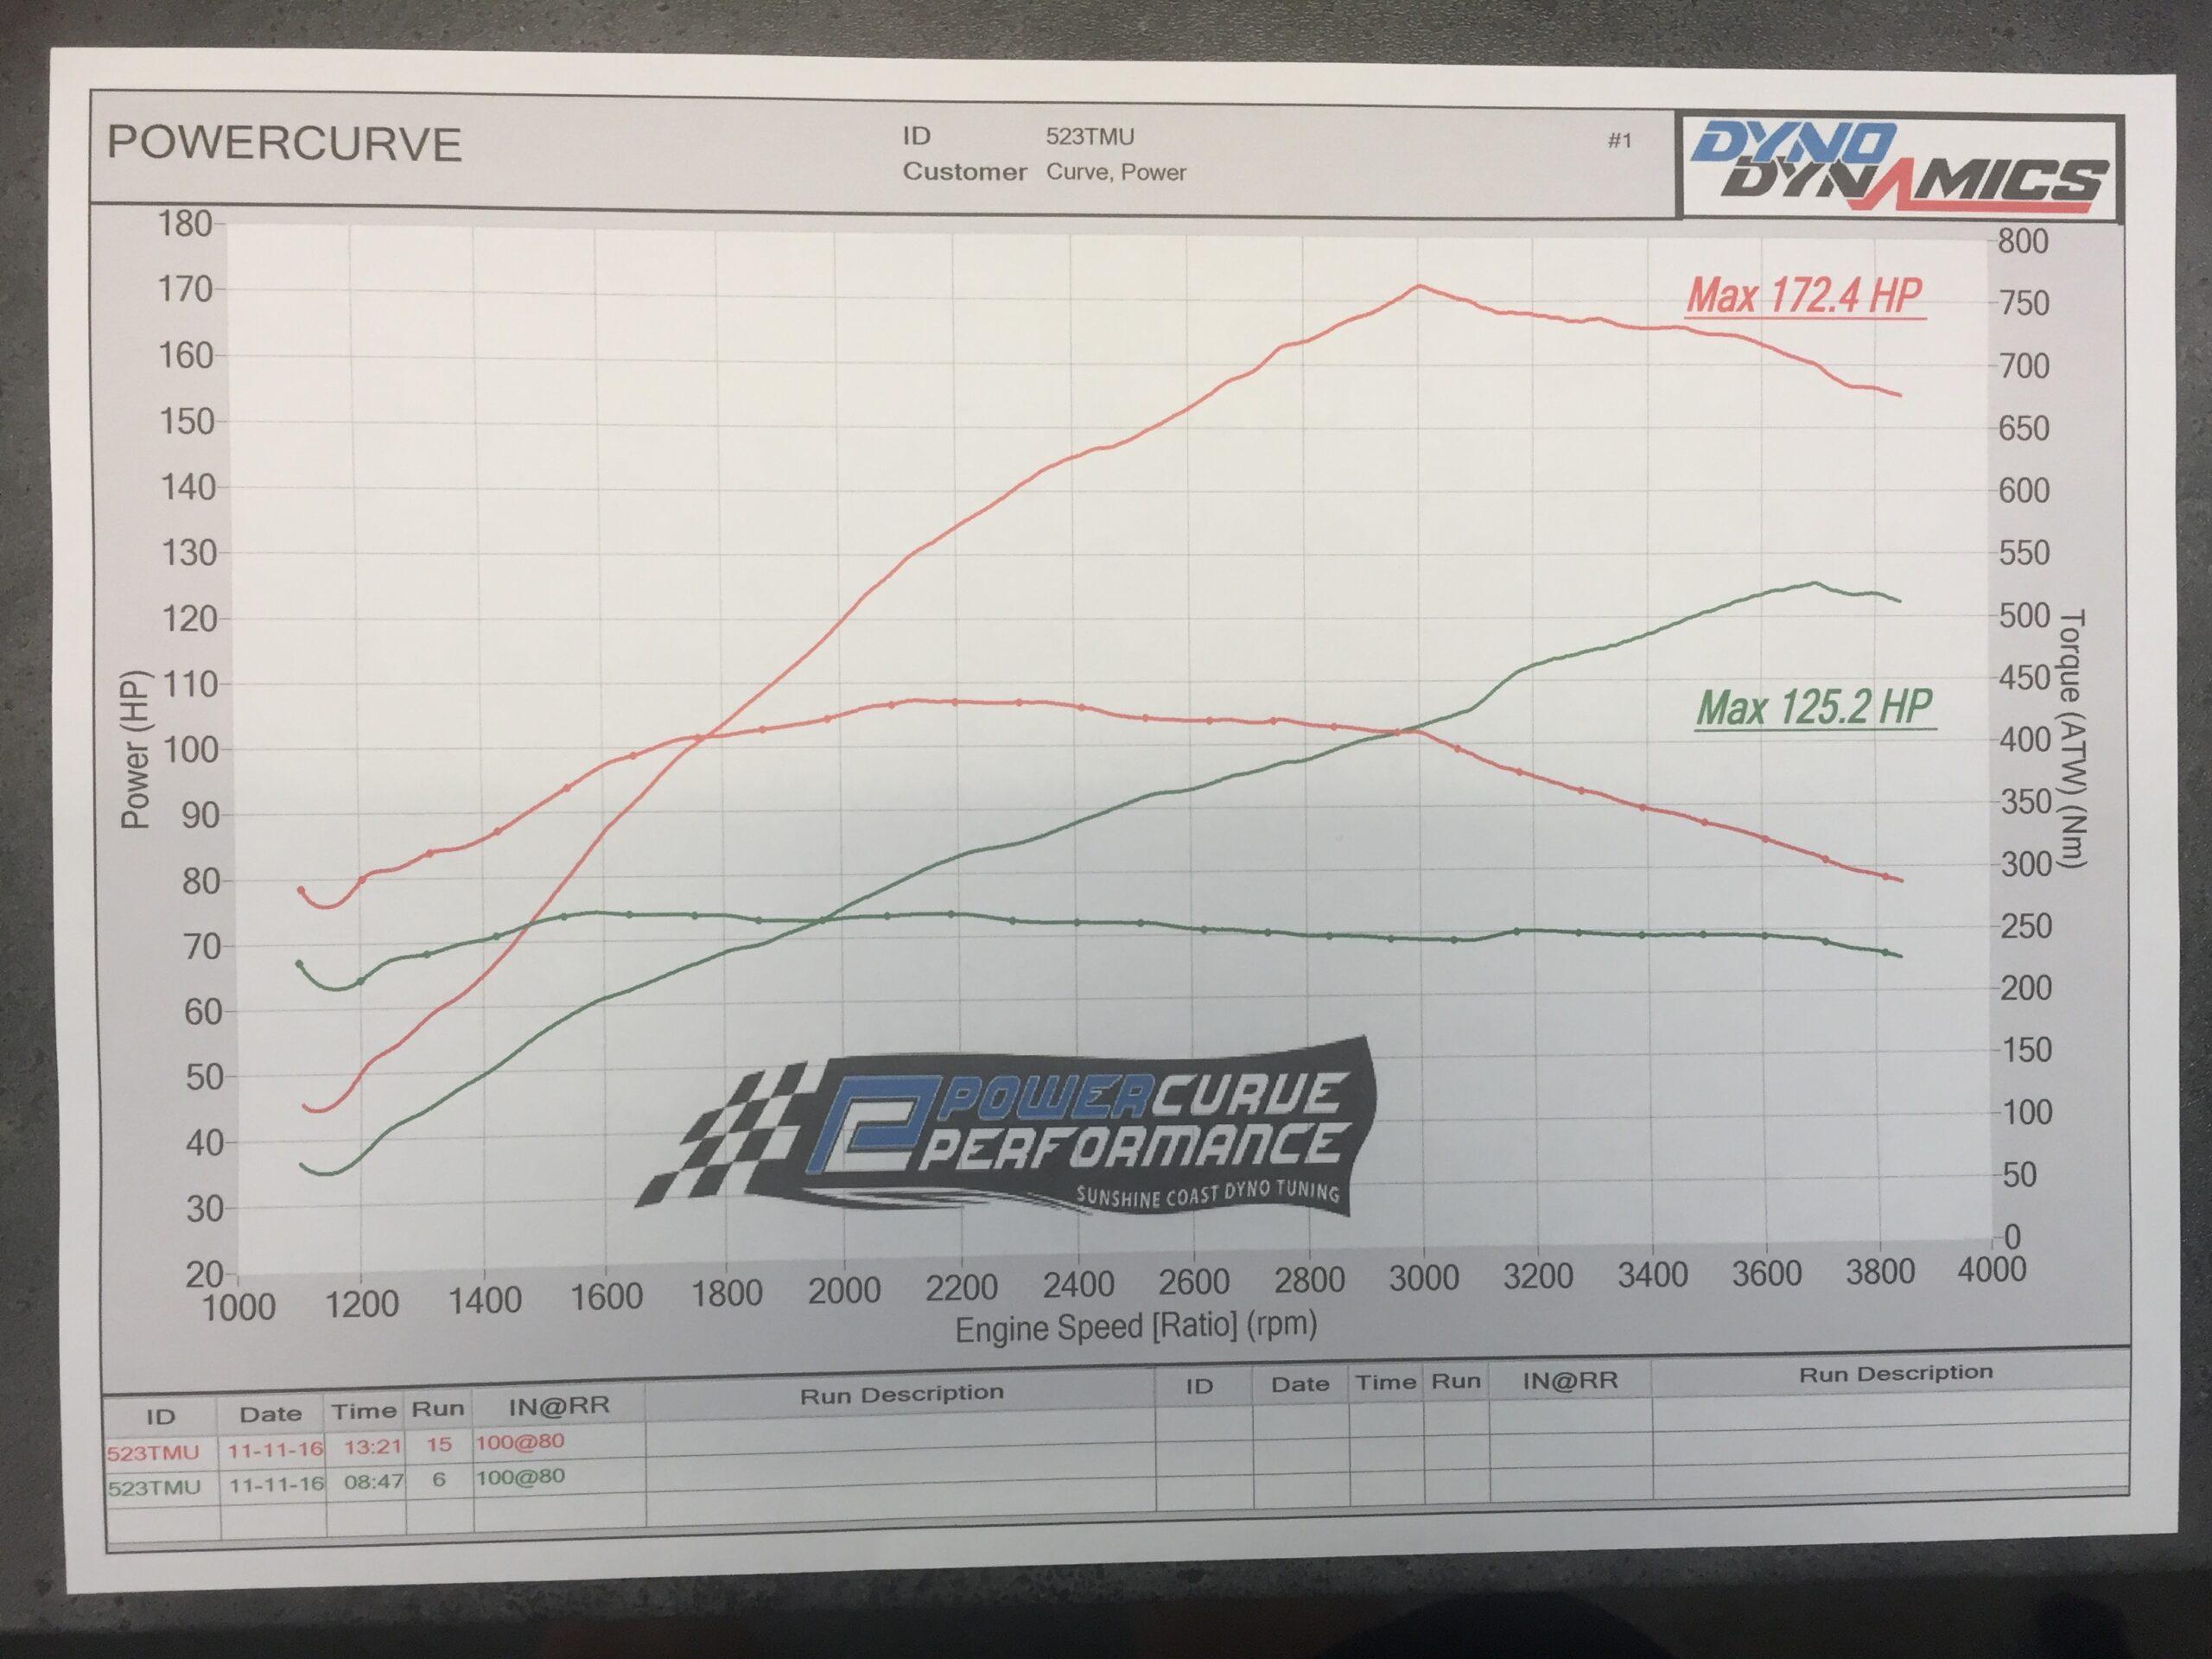 2013 Isuzu Dmax, Diesel ECU Tune, Power Curve Performance